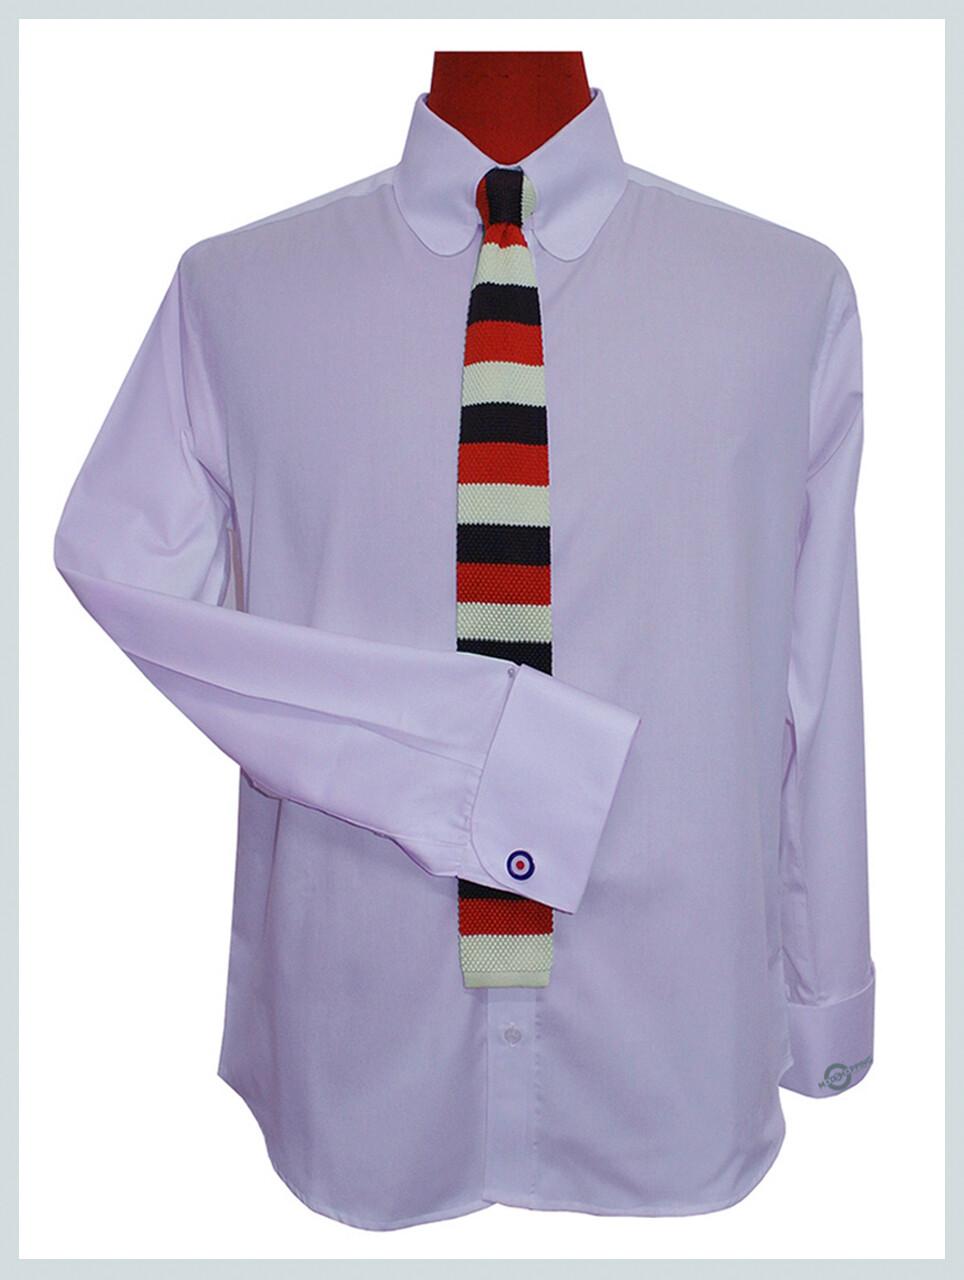 Lilac Shirt| Penny Pin Collar Long Sleeve Vintage Lavender Shirt For Men